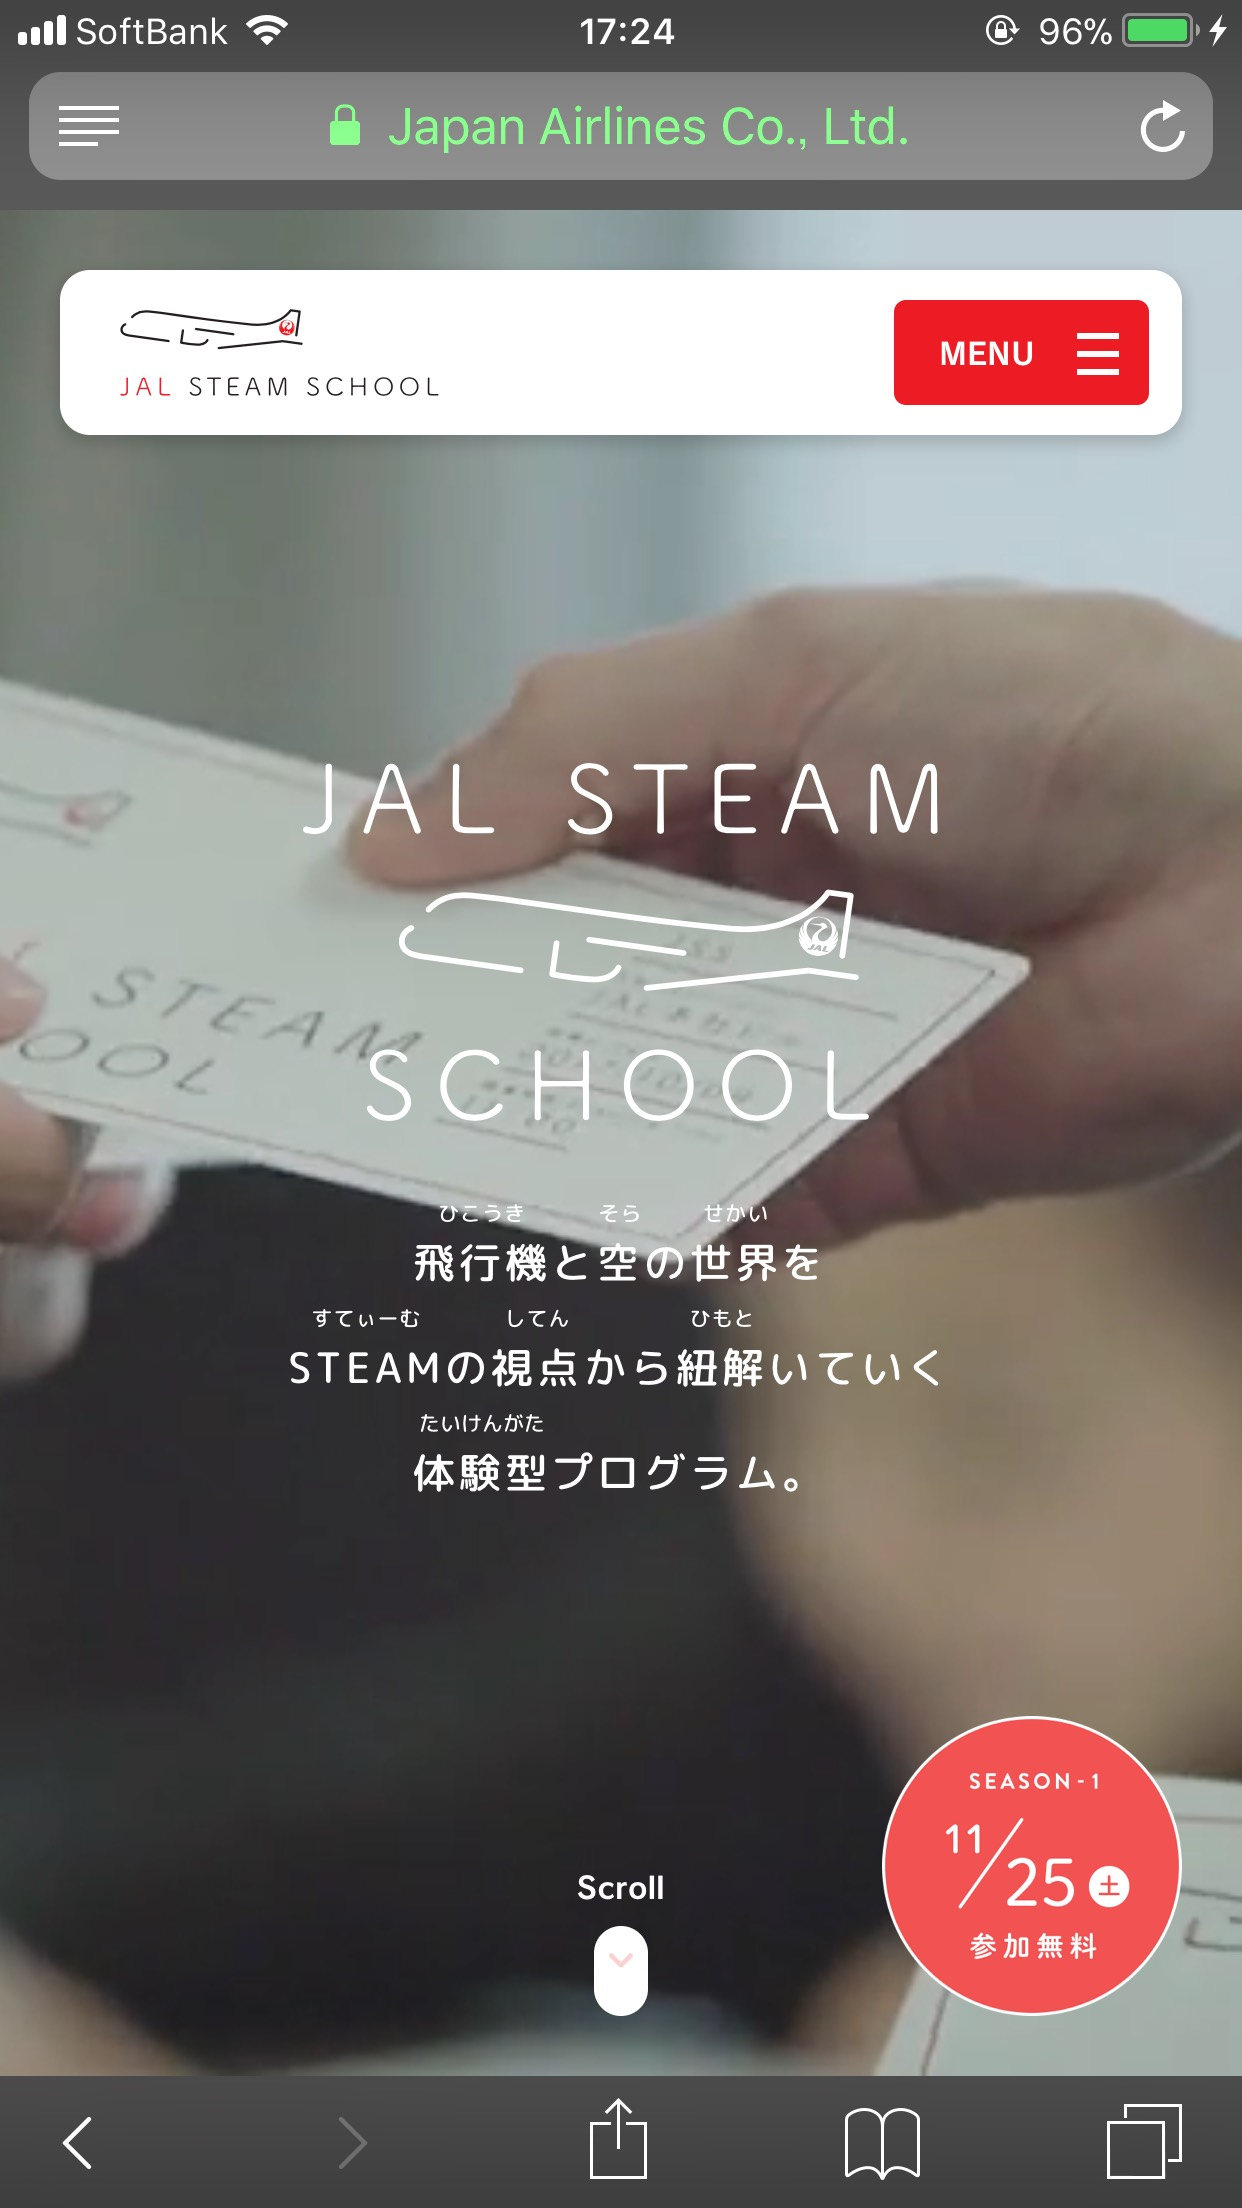 - JAL STEAM SCHOOL - 飛行機と空の世界をSTEAMで紐解く体験型プログラム